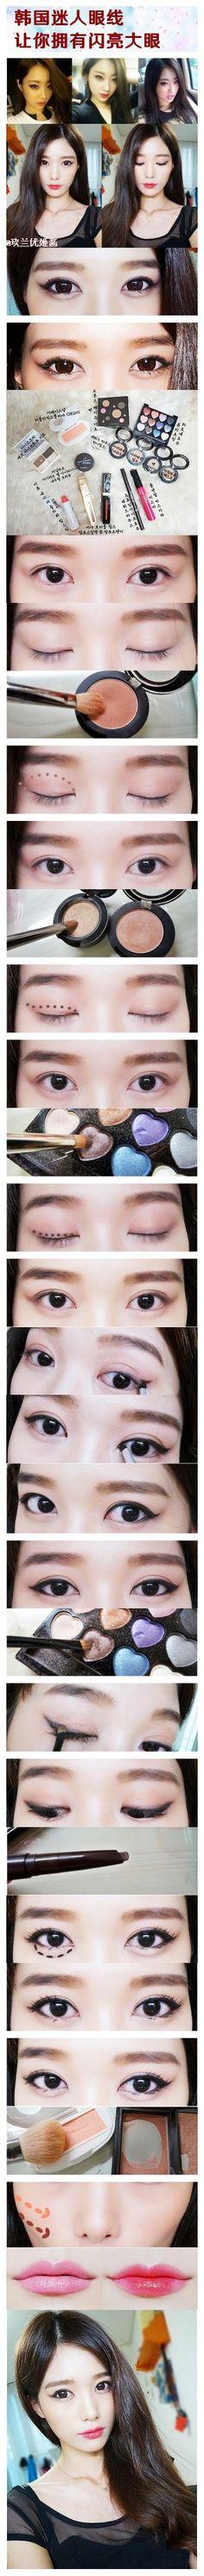 Korean make up - again with the eye bags  www.AsianSkincare.Rocks